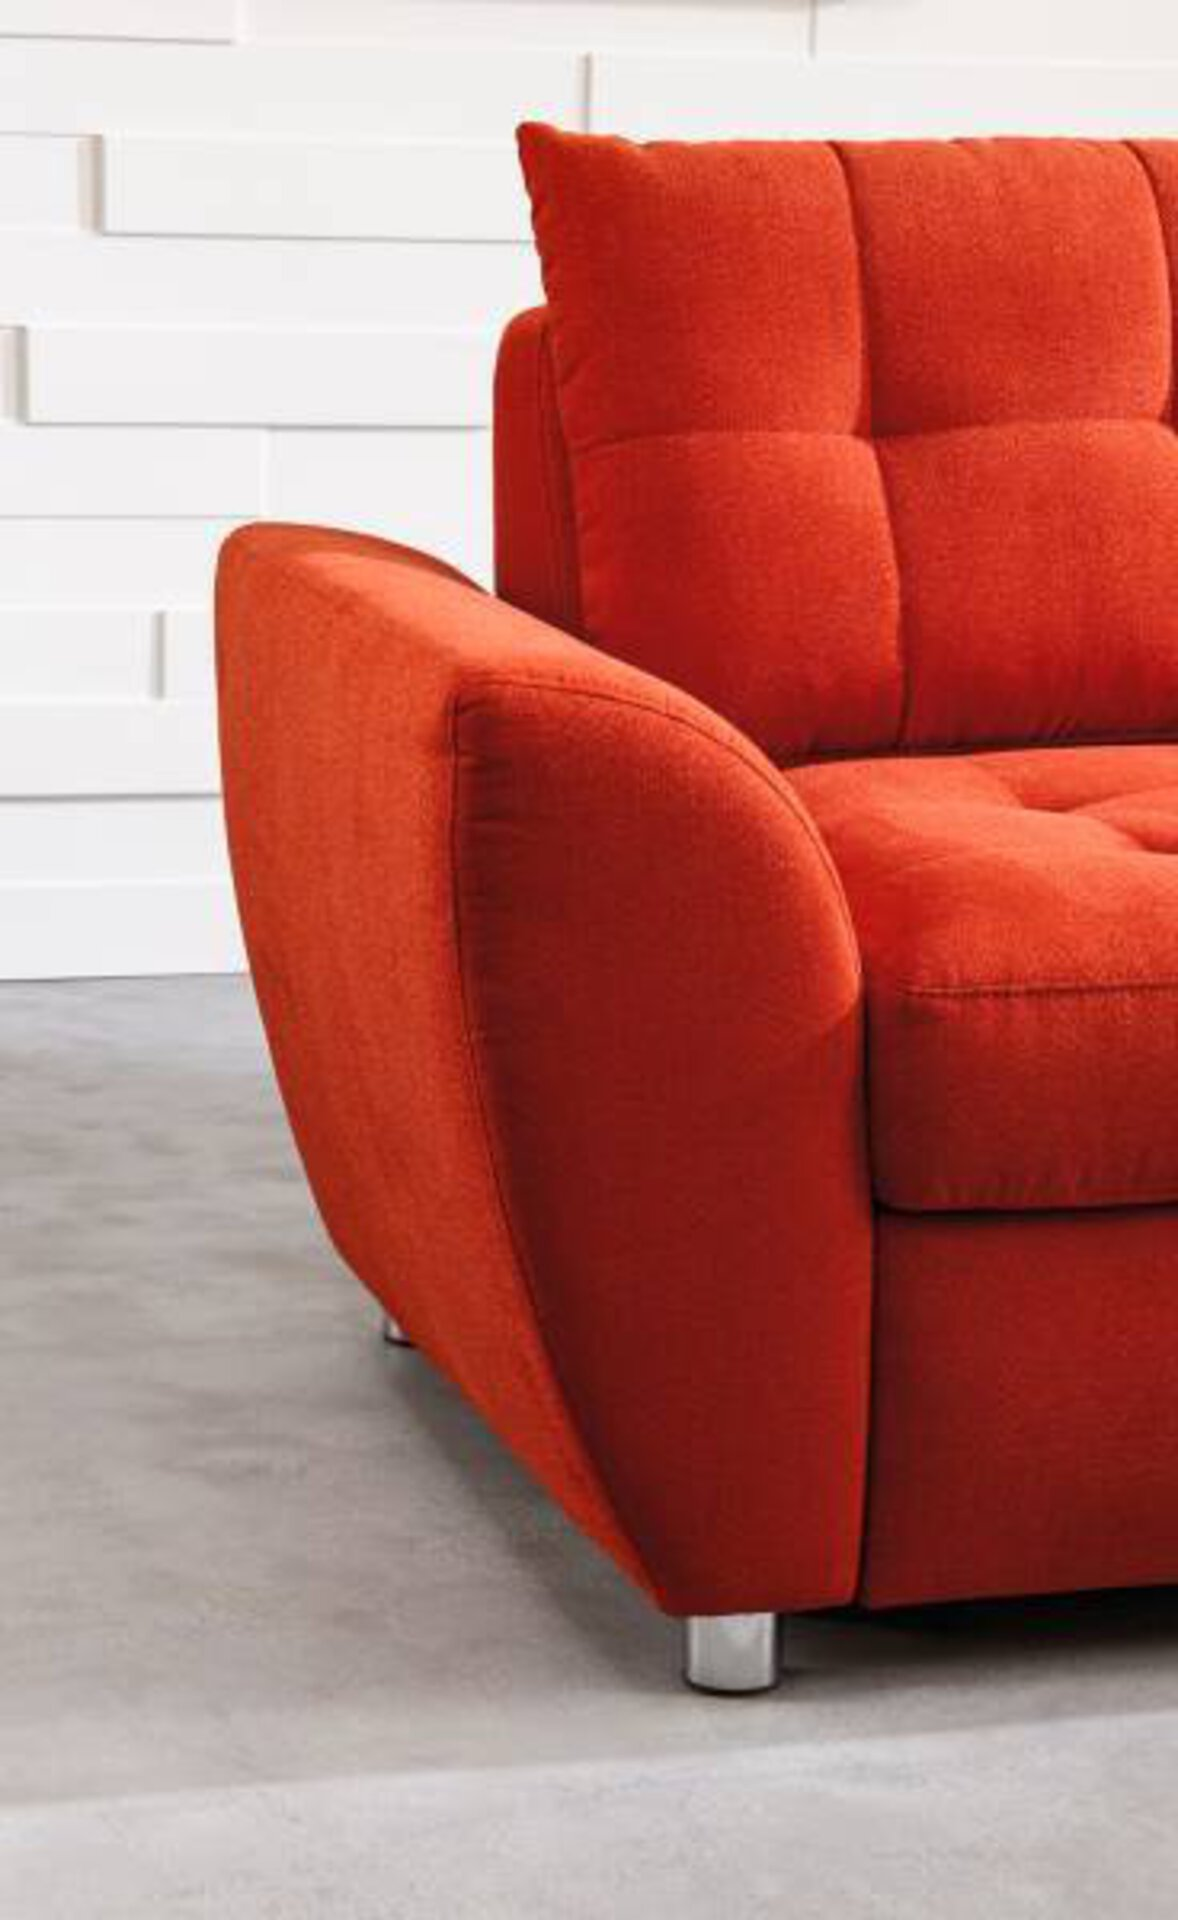 Sofa 2-Sitzer SYSTEMO Vito Textil orange 140 x 90 x 97 cm